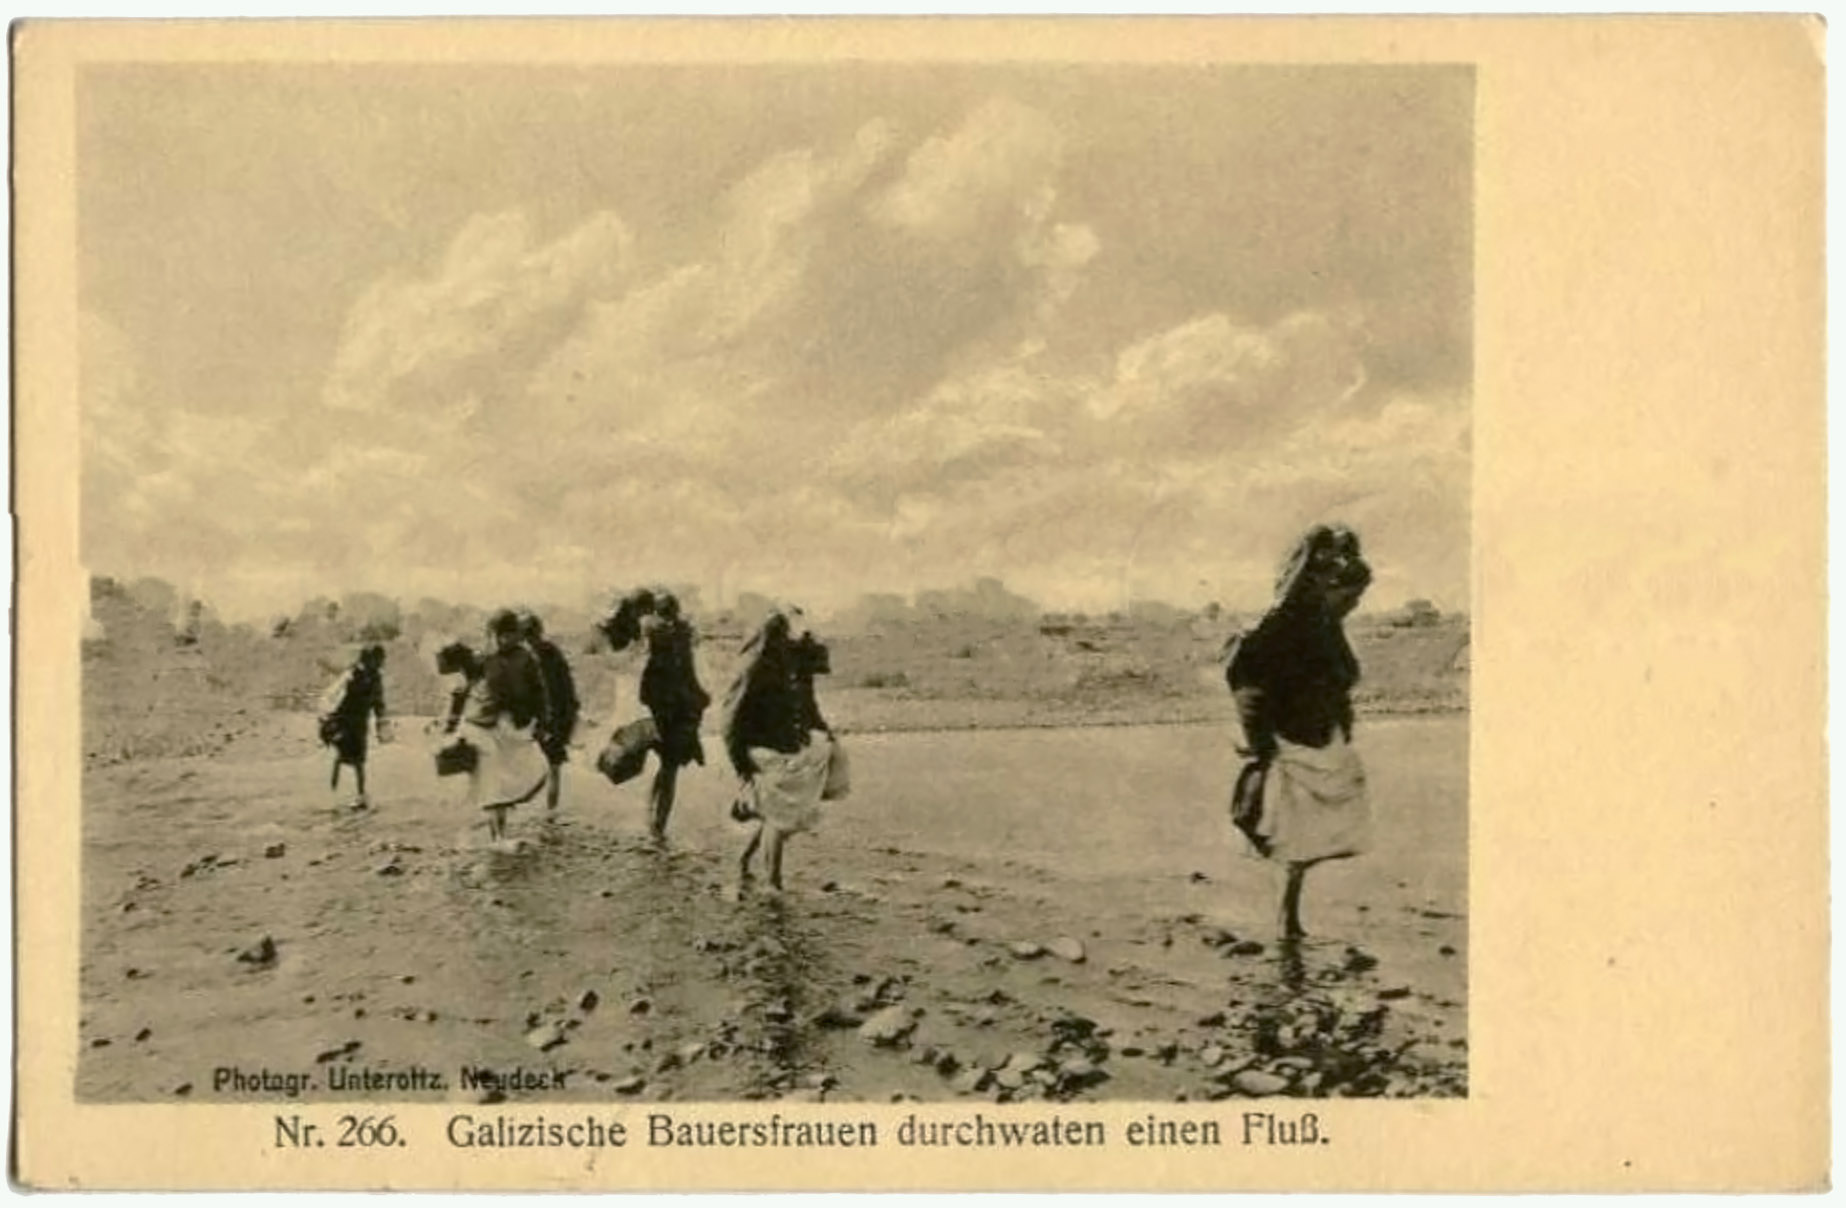 "Postcard: ""Nr. 266. Galician peasant women wading through a river."", photographer: Unteroltz, Neudeck"